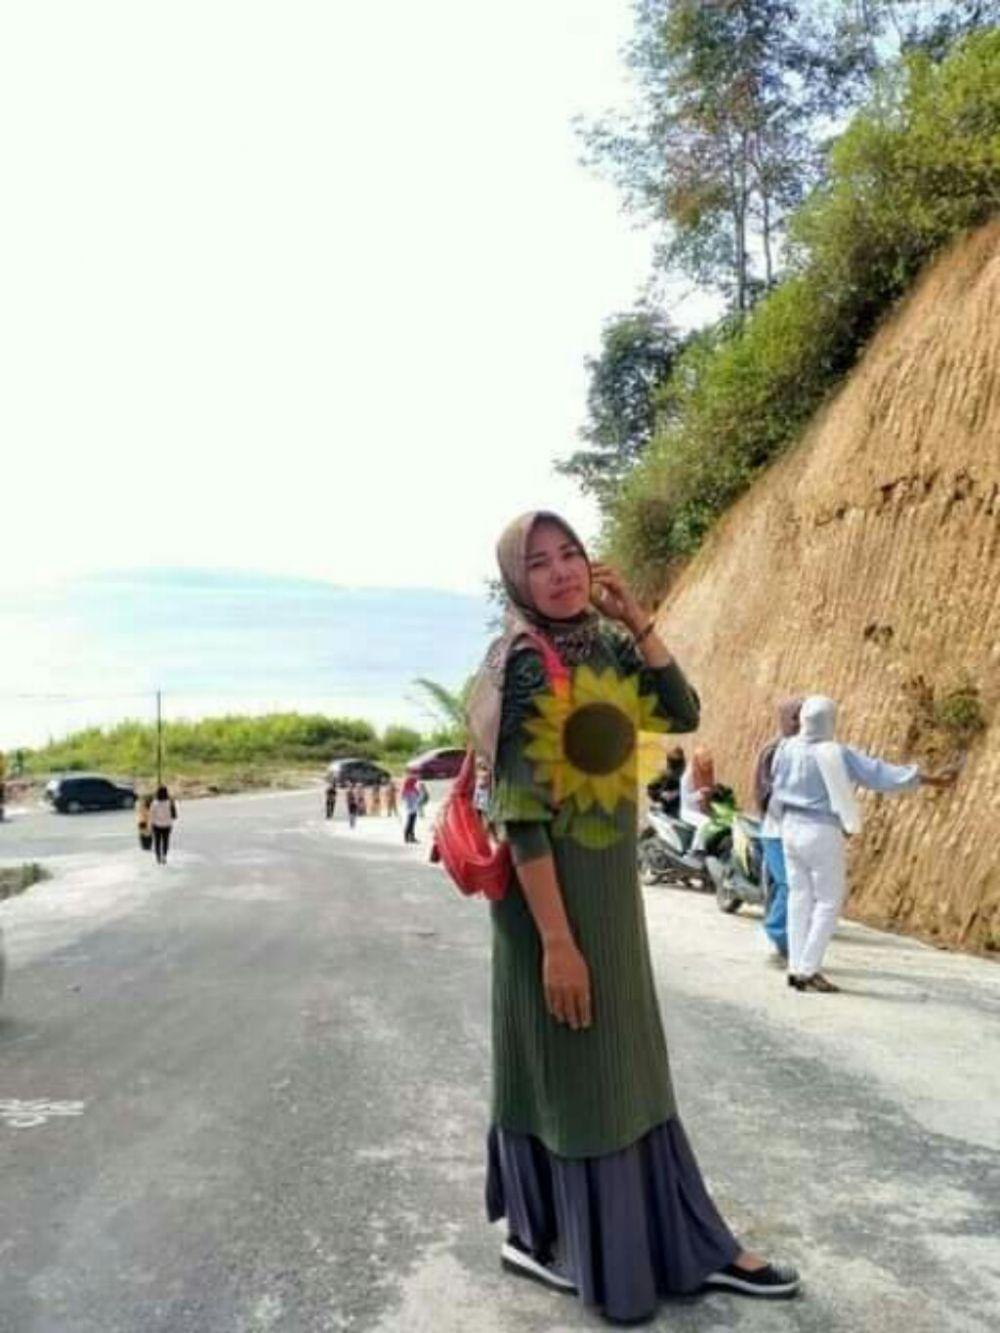 Disebut Mirip Jalan Pulau Mandeh, Jalan Tanjung Batu Viral